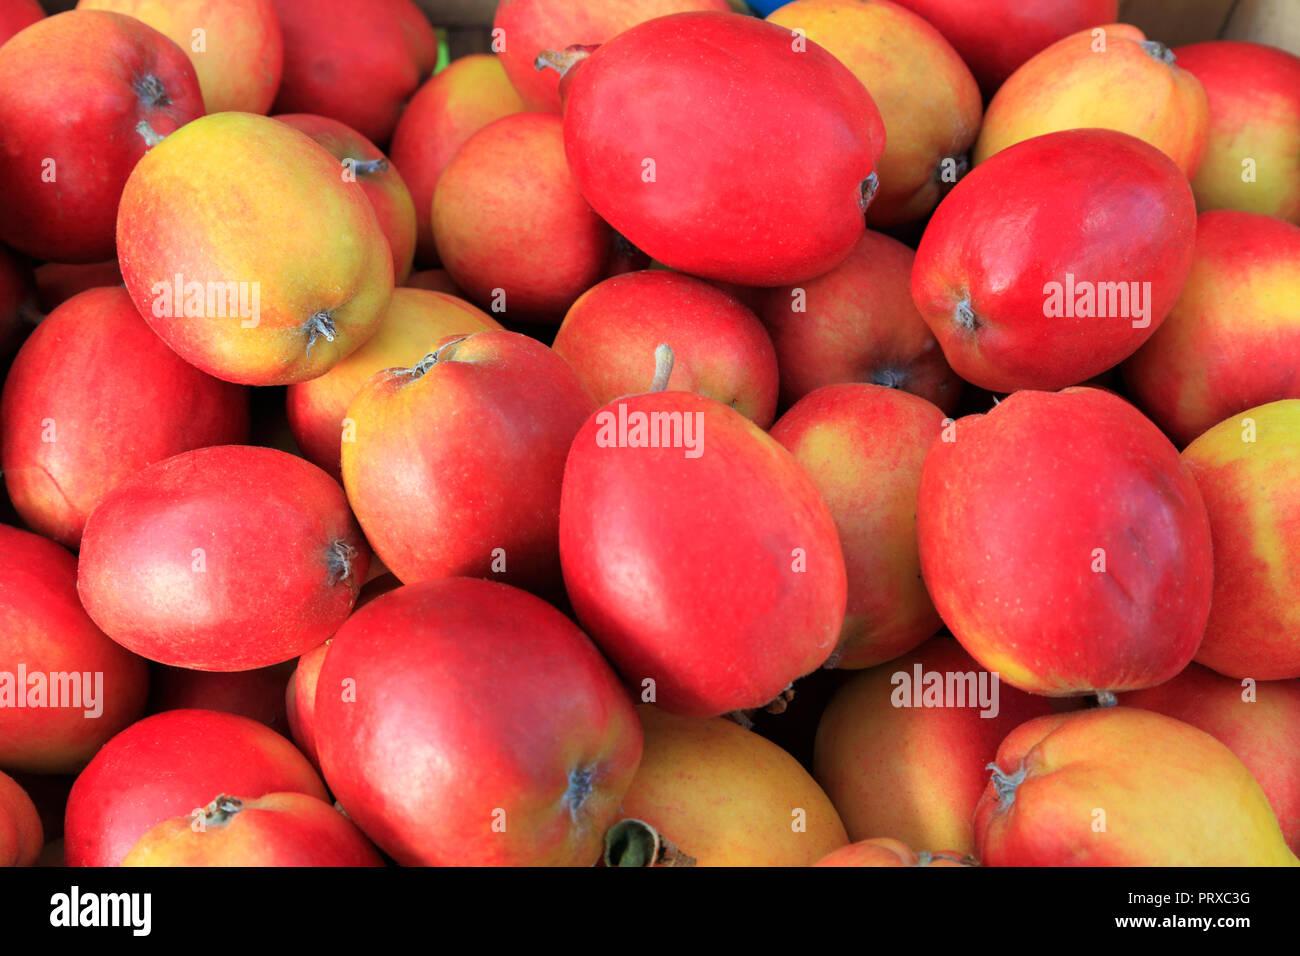 Apple, 'Oakham Pippin', apples, malus domestica, farm shop, display, edible, fruit - Stock Image